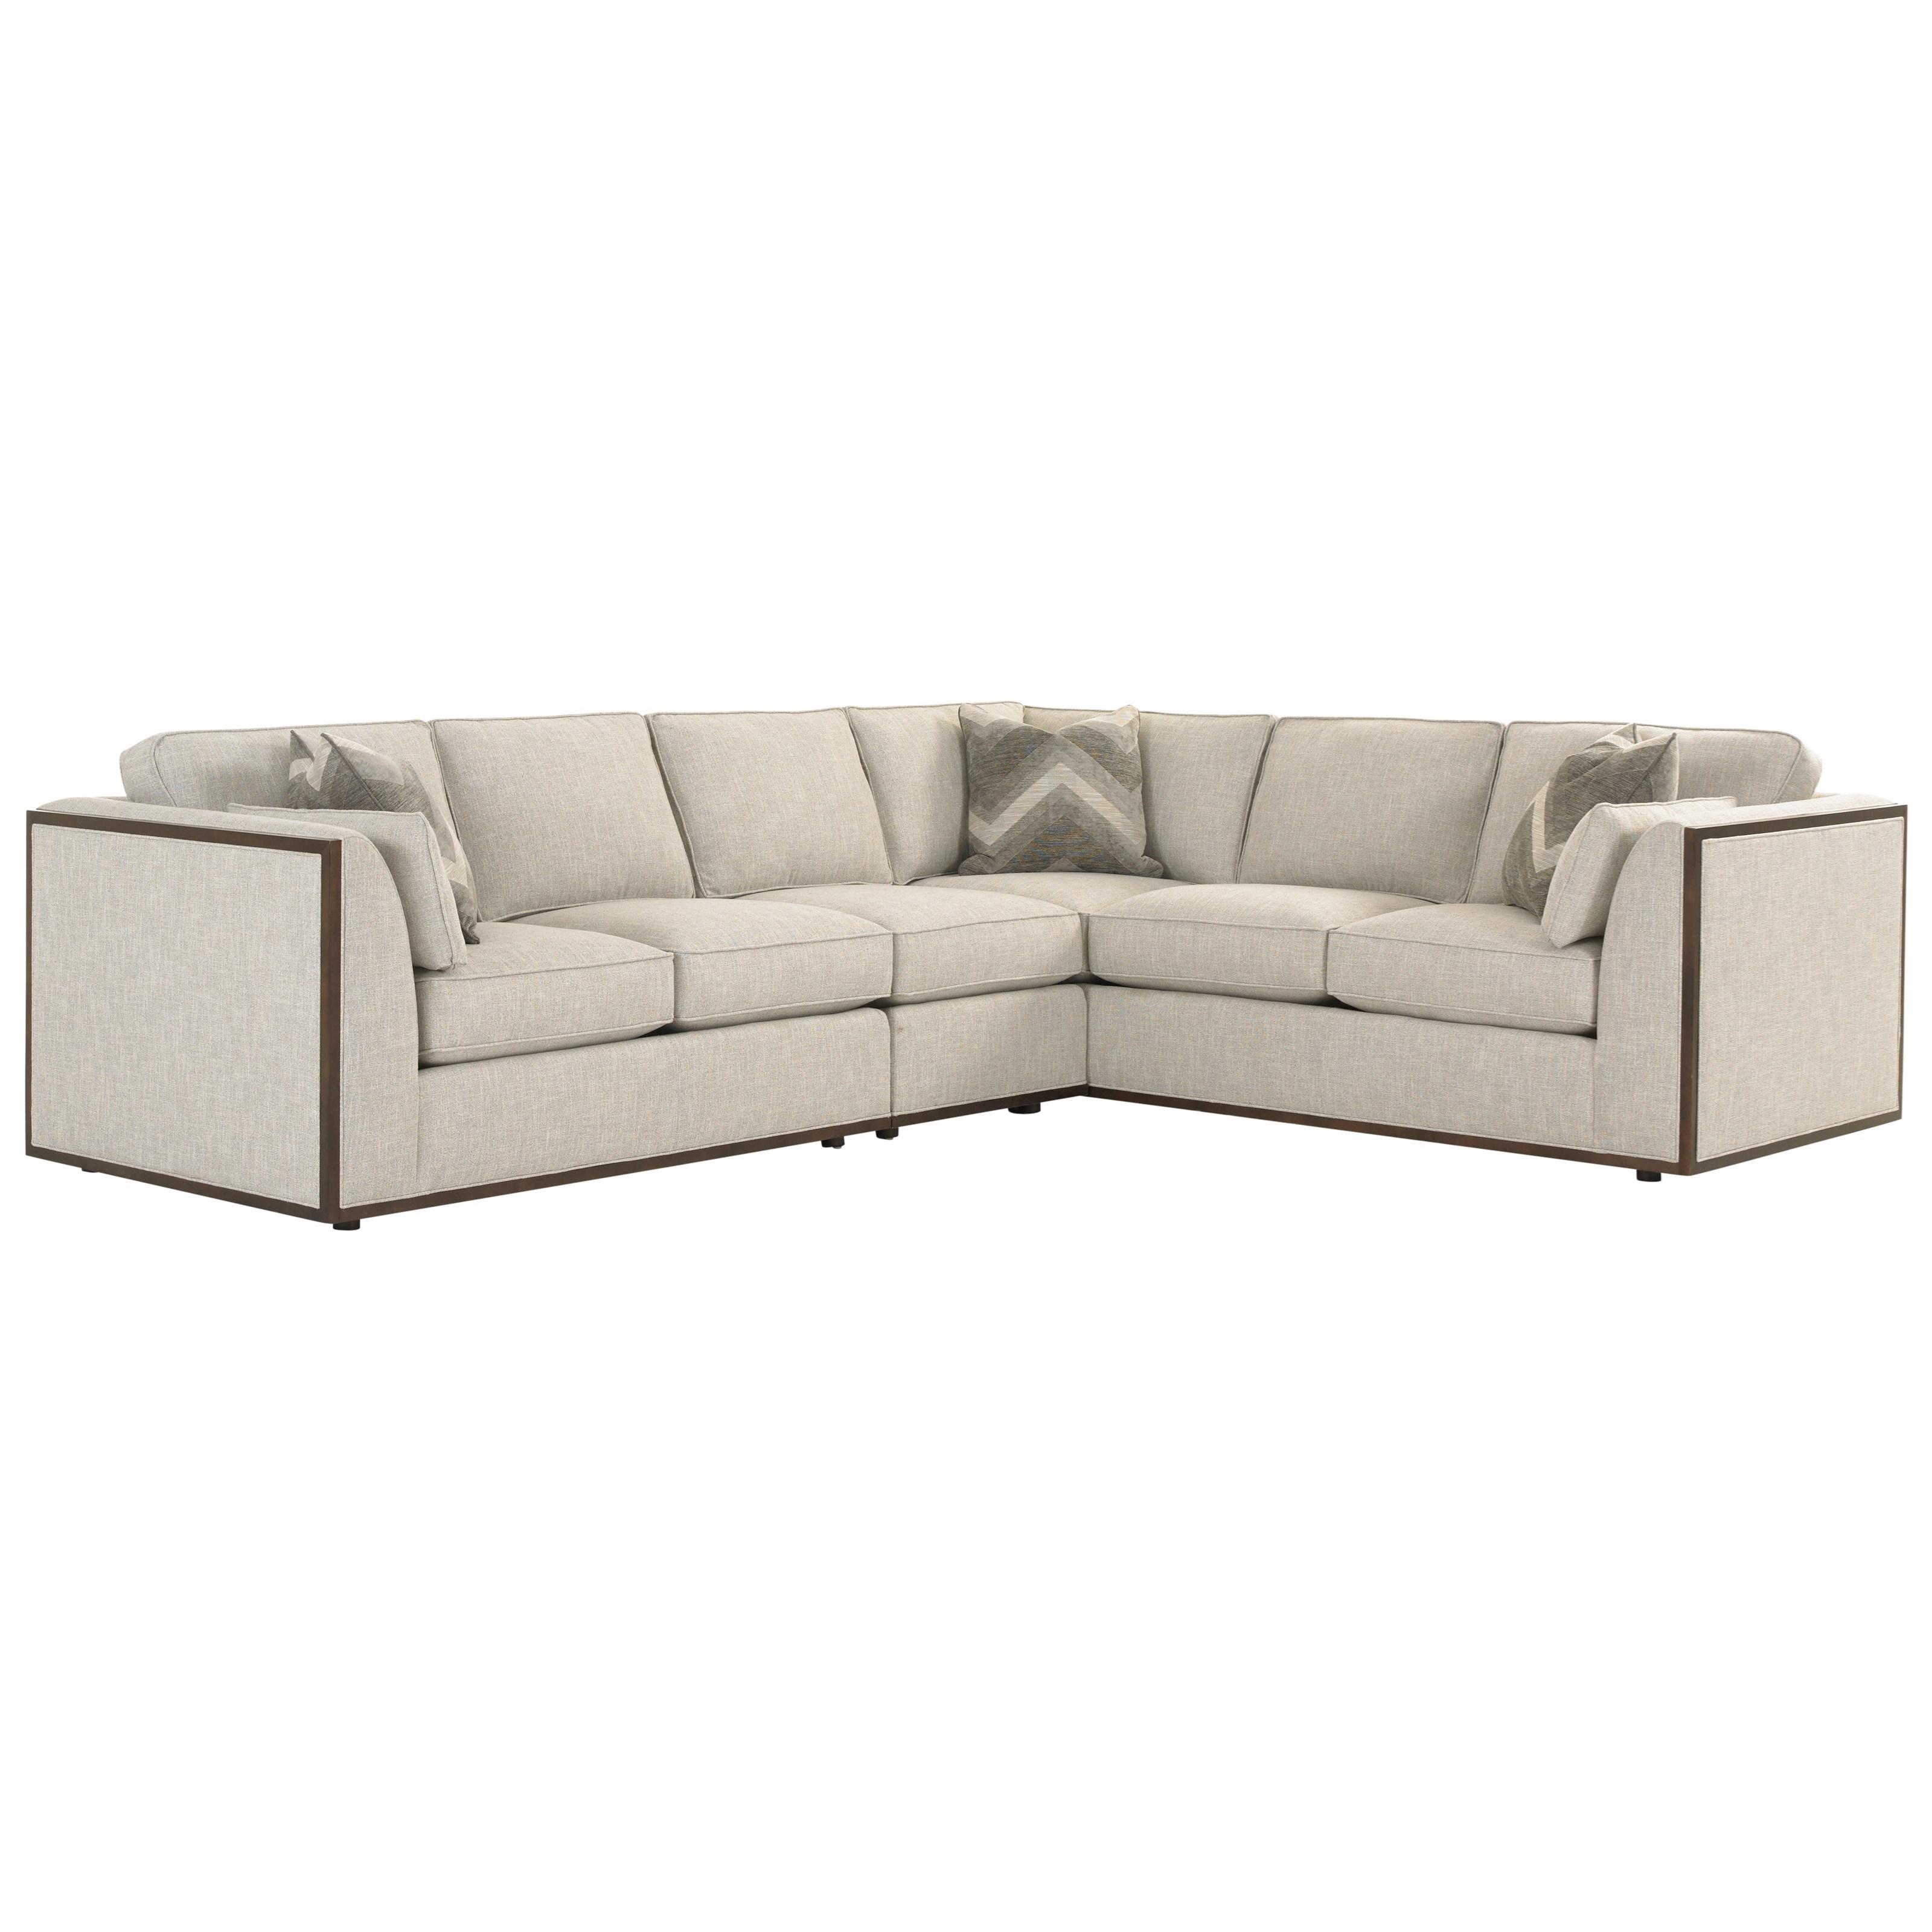 Lexington macarthur park westcliffe three piece corner for 3 piece corner sectional sofa